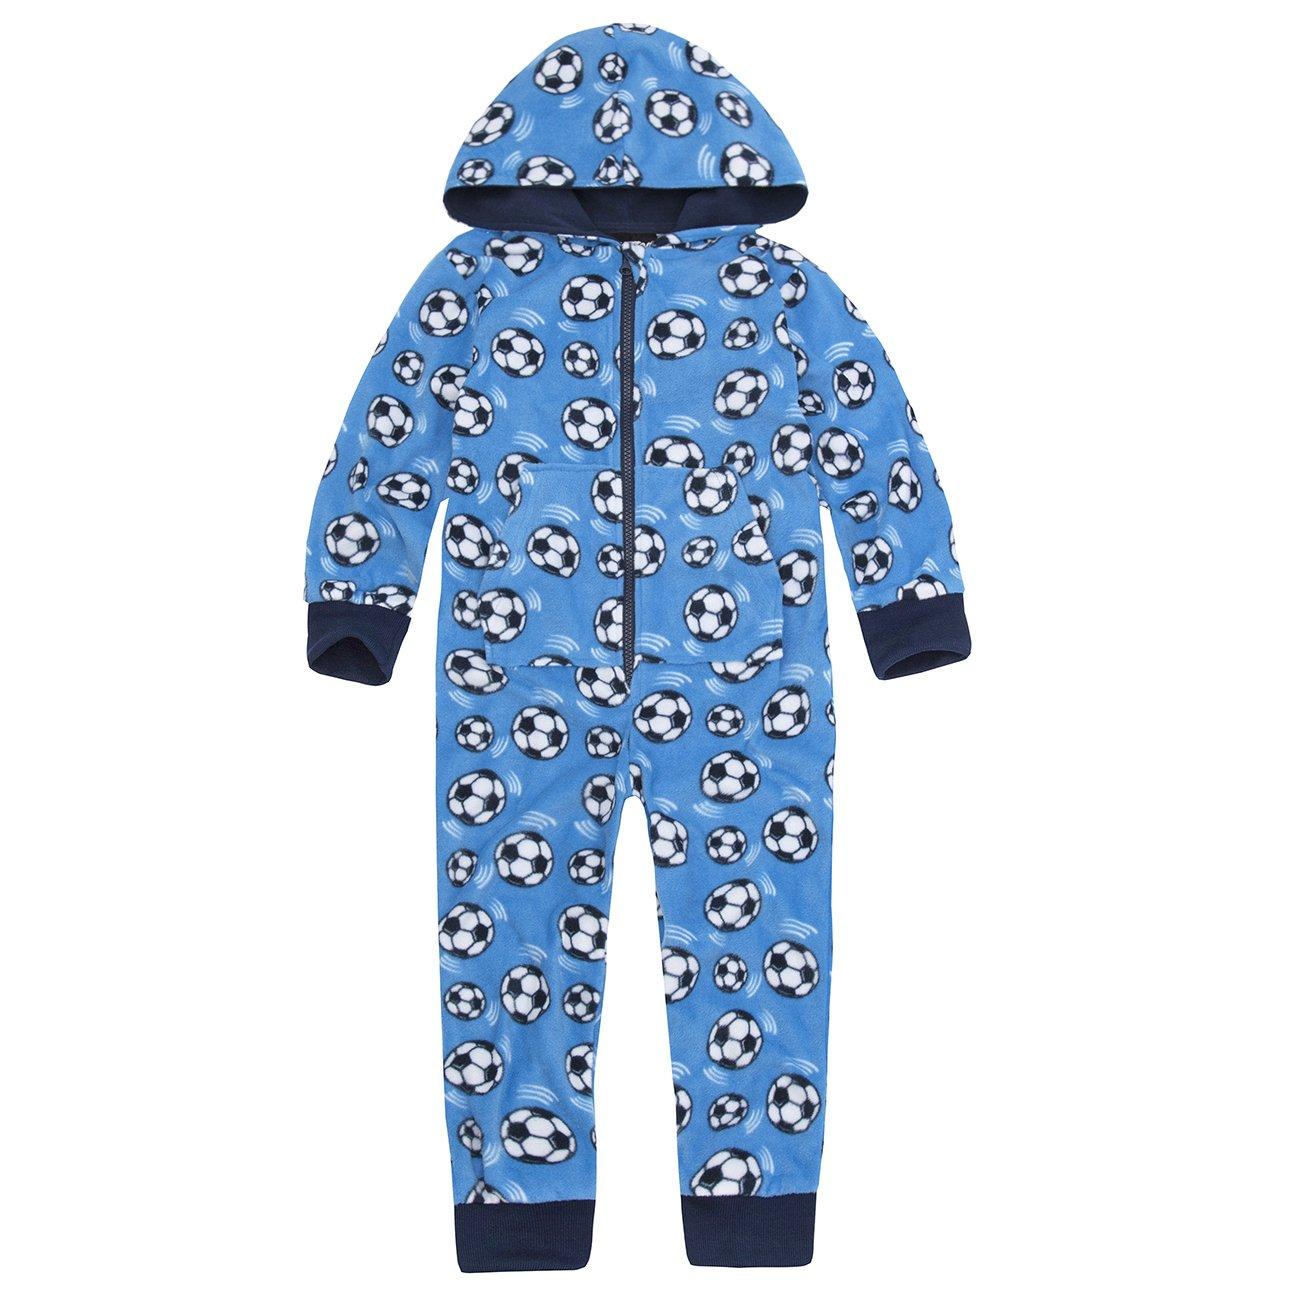 Onezee Kids Boys Fleece Jumpsuit (Sizes 2-6 Years) Hooded Football Pyjamas